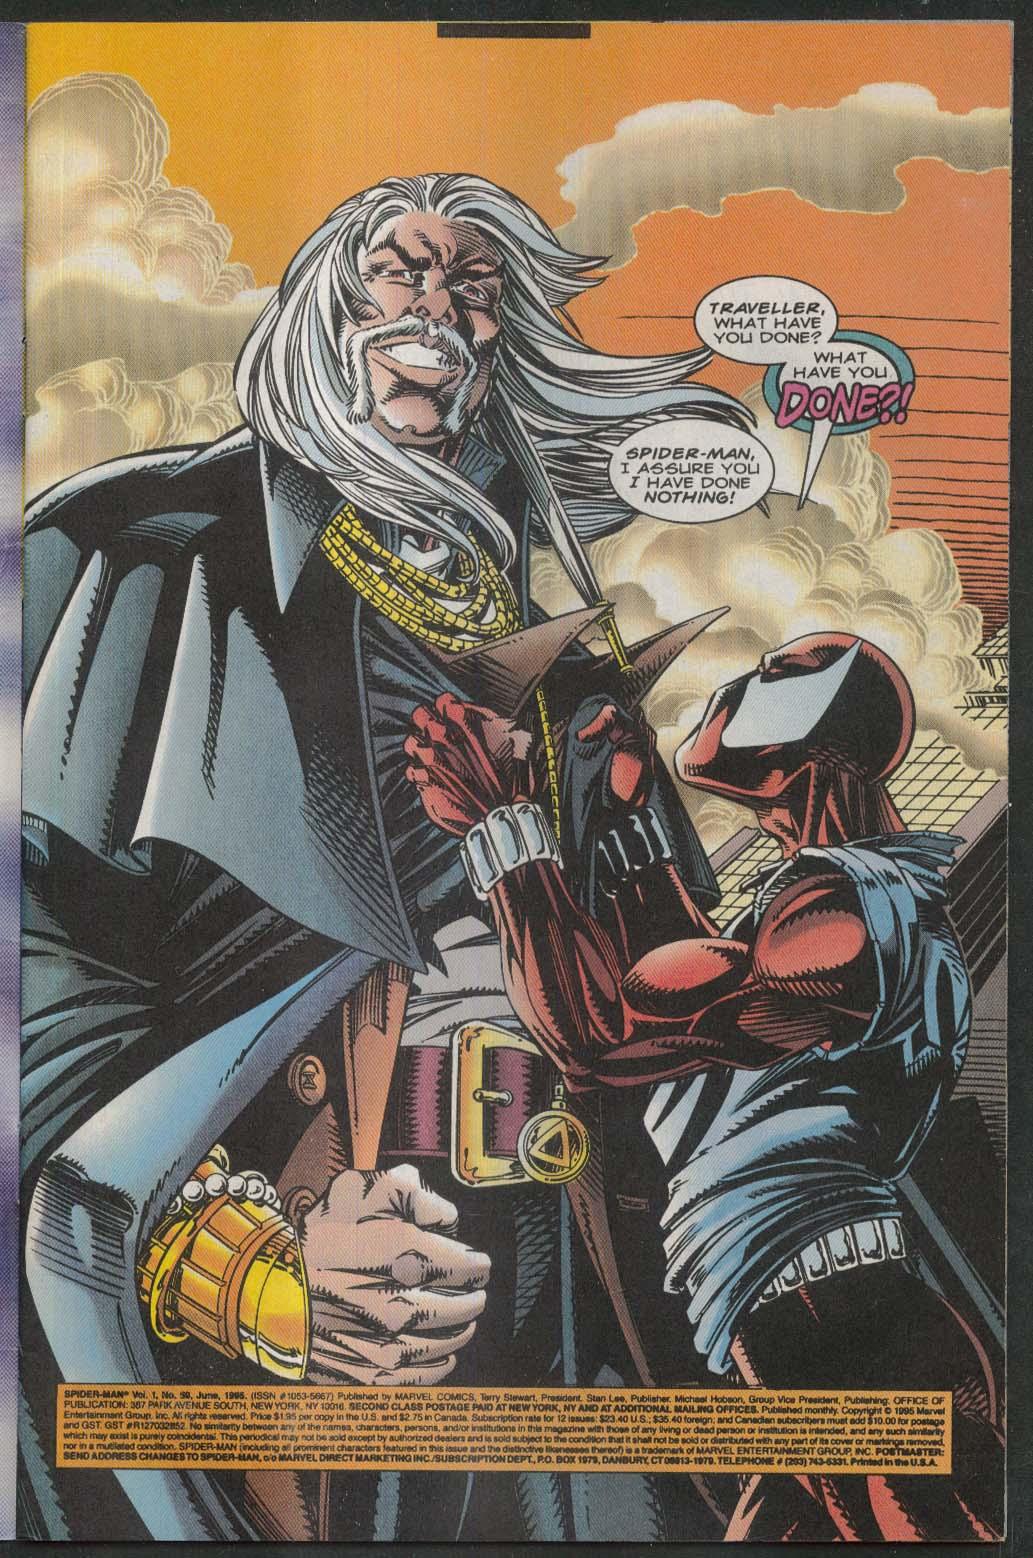 SPIDER-MAN #59 Marvel comic book 6 1995